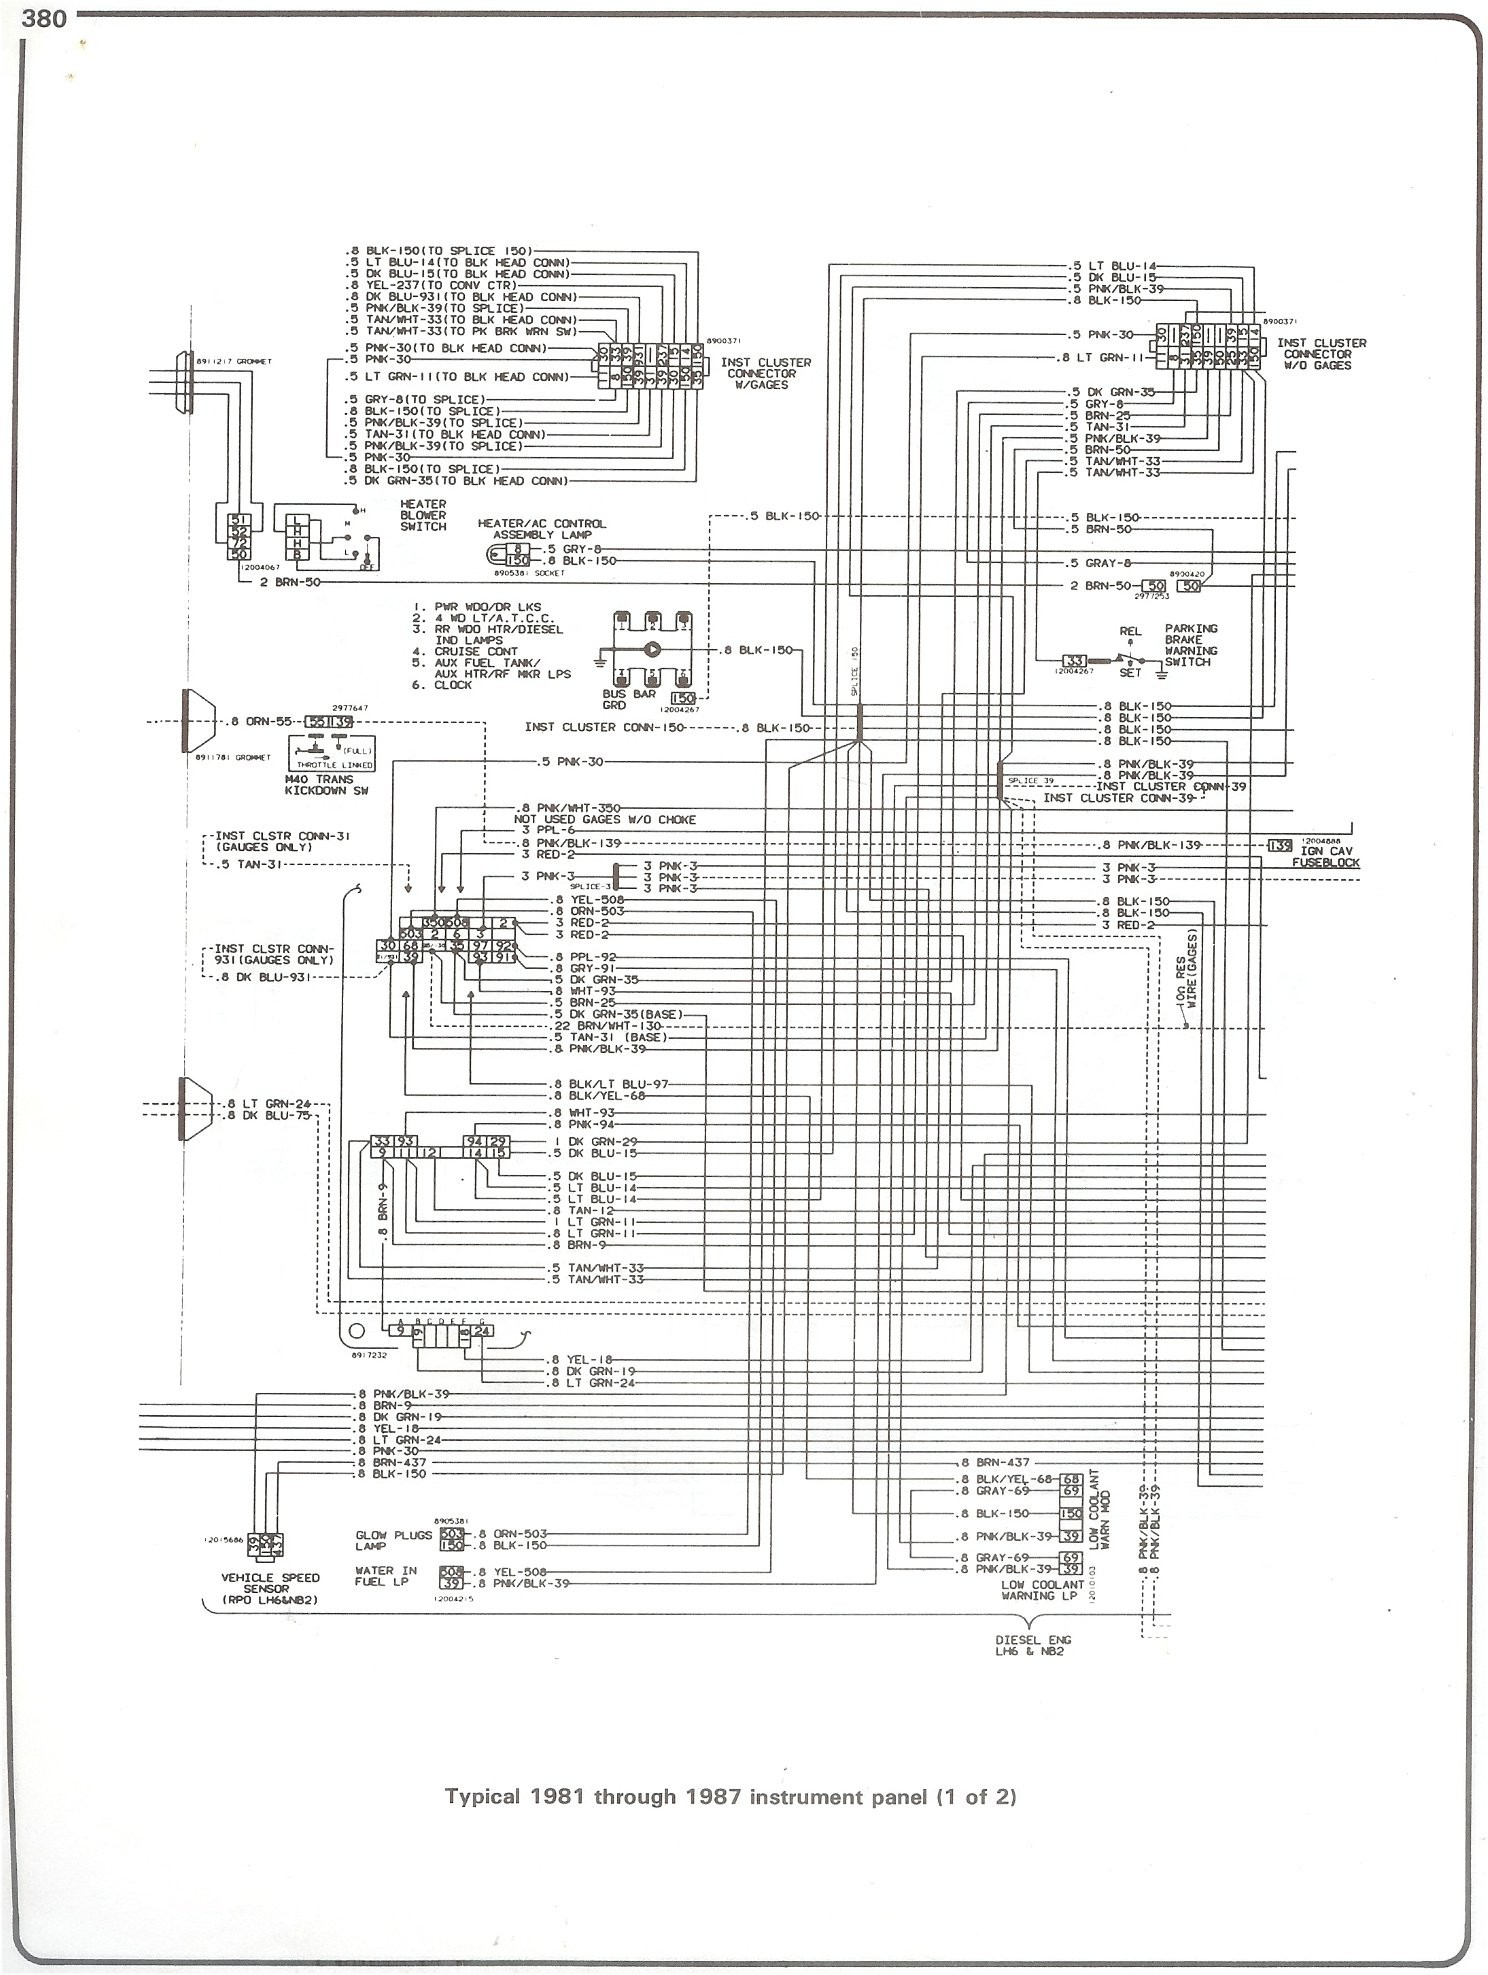 Truck Wiring Diagrams Chevrolet P30 Wiring Diagram Get Free Image About Wiring Diagram Of Truck Wiring Diagrams